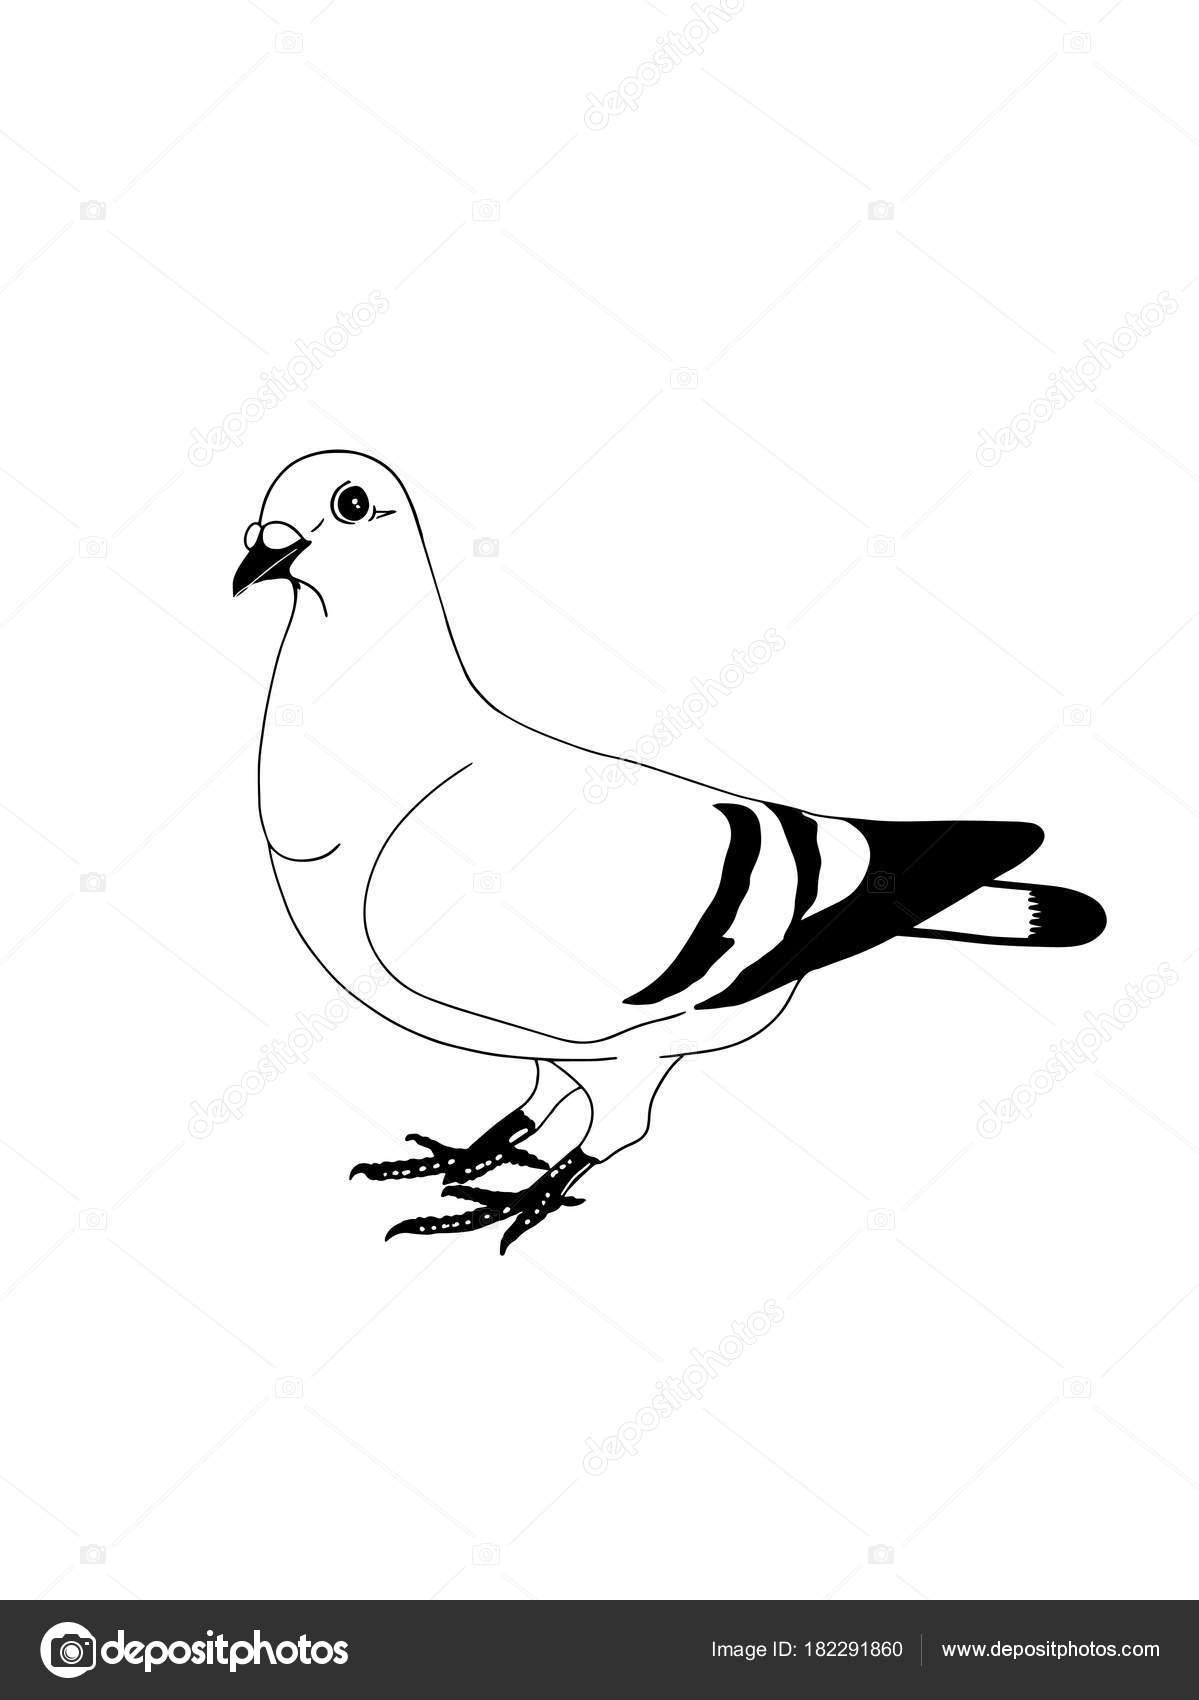 Pigeon Illustration Dessin Fond Blanc Photographie Designartks